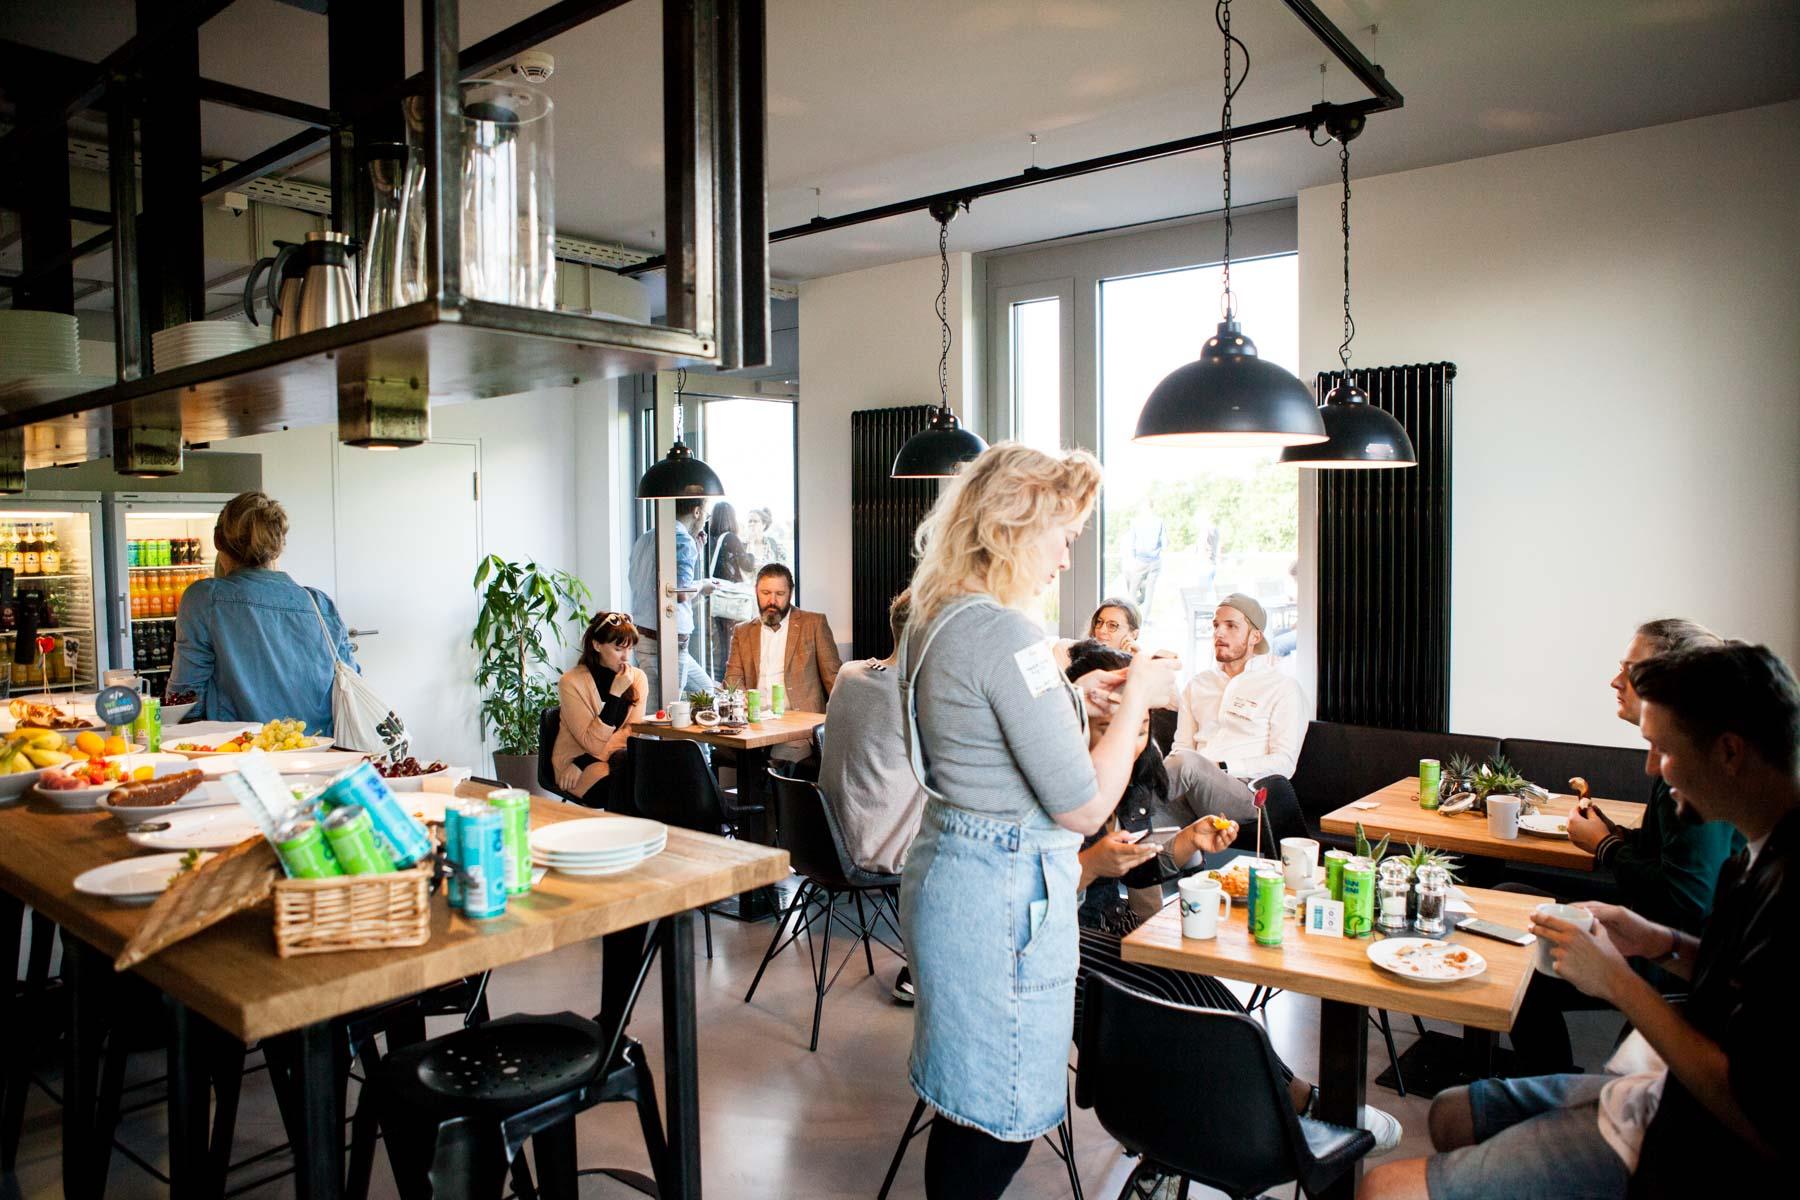 creative mornings köln vortrag frühstück grandceantrix Michaela Berghaus Veronica Garcia unterhaltung gespräch küche essen jörn strojny